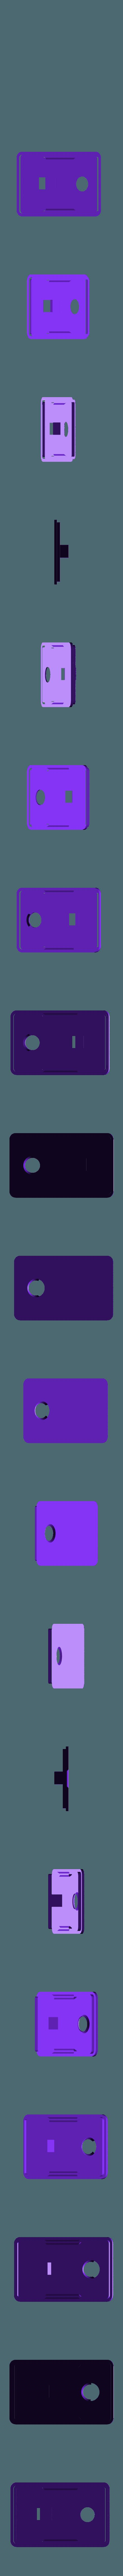 trampoline-cover.stl Download free STL file LED Trampoline – NeoPixels and CircuitPython • 3D printer object, Adafruit